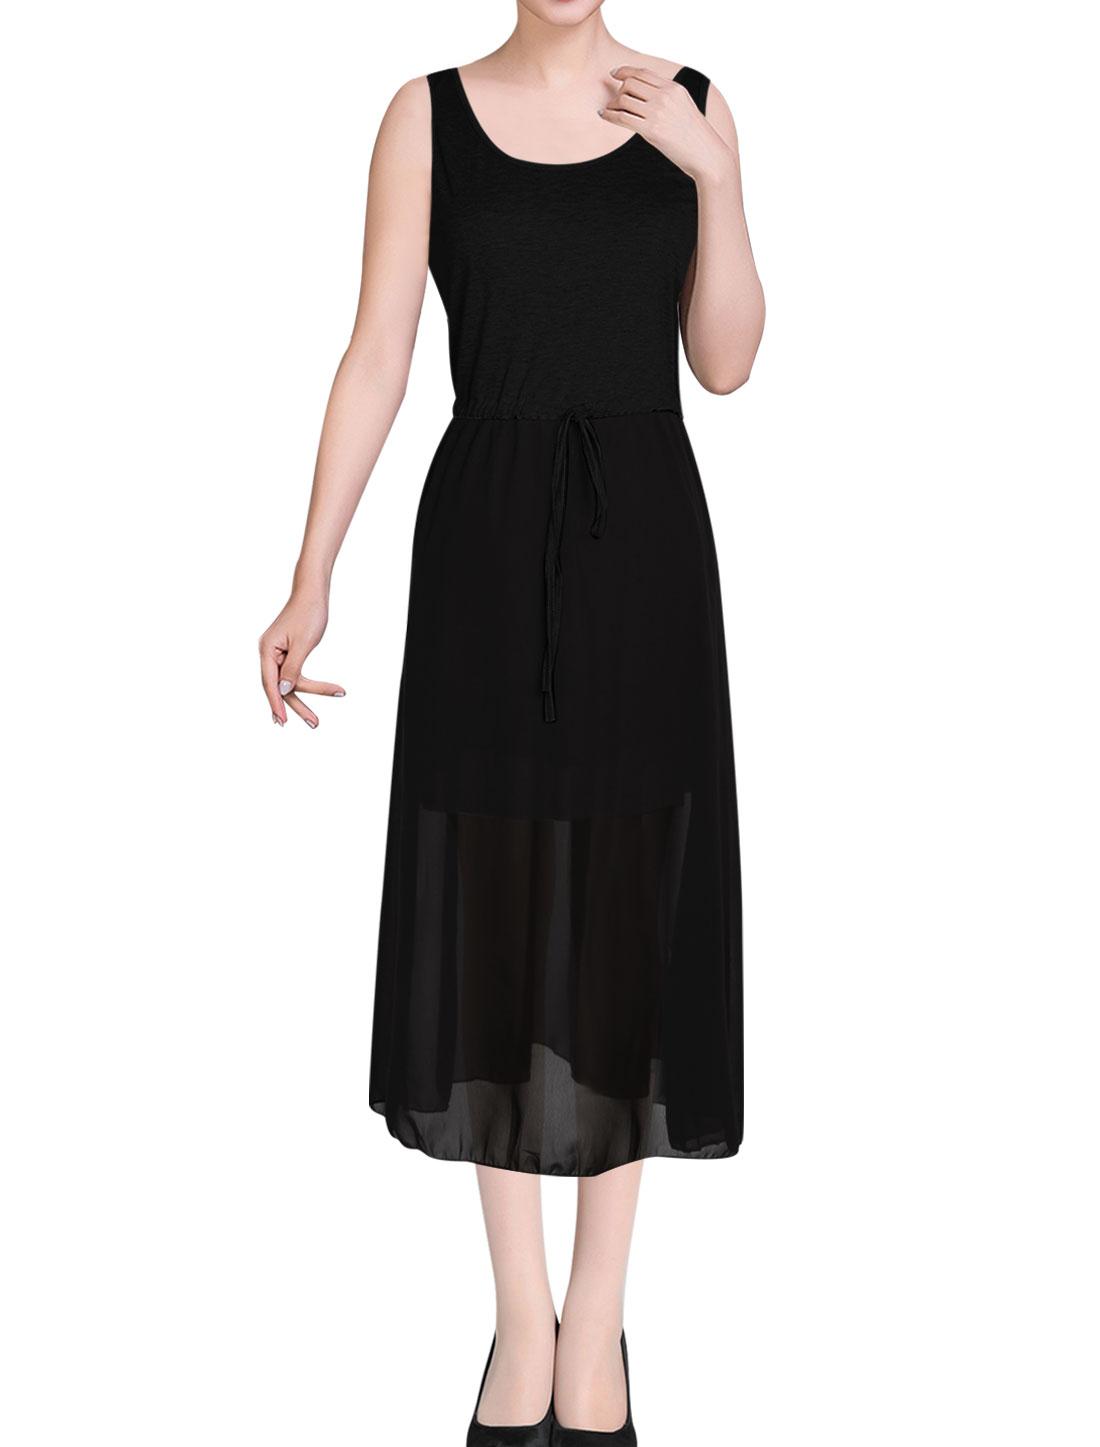 Ladies Scoop Neck Sleeveless Drawstring Detail Chiffon Dress Black XS